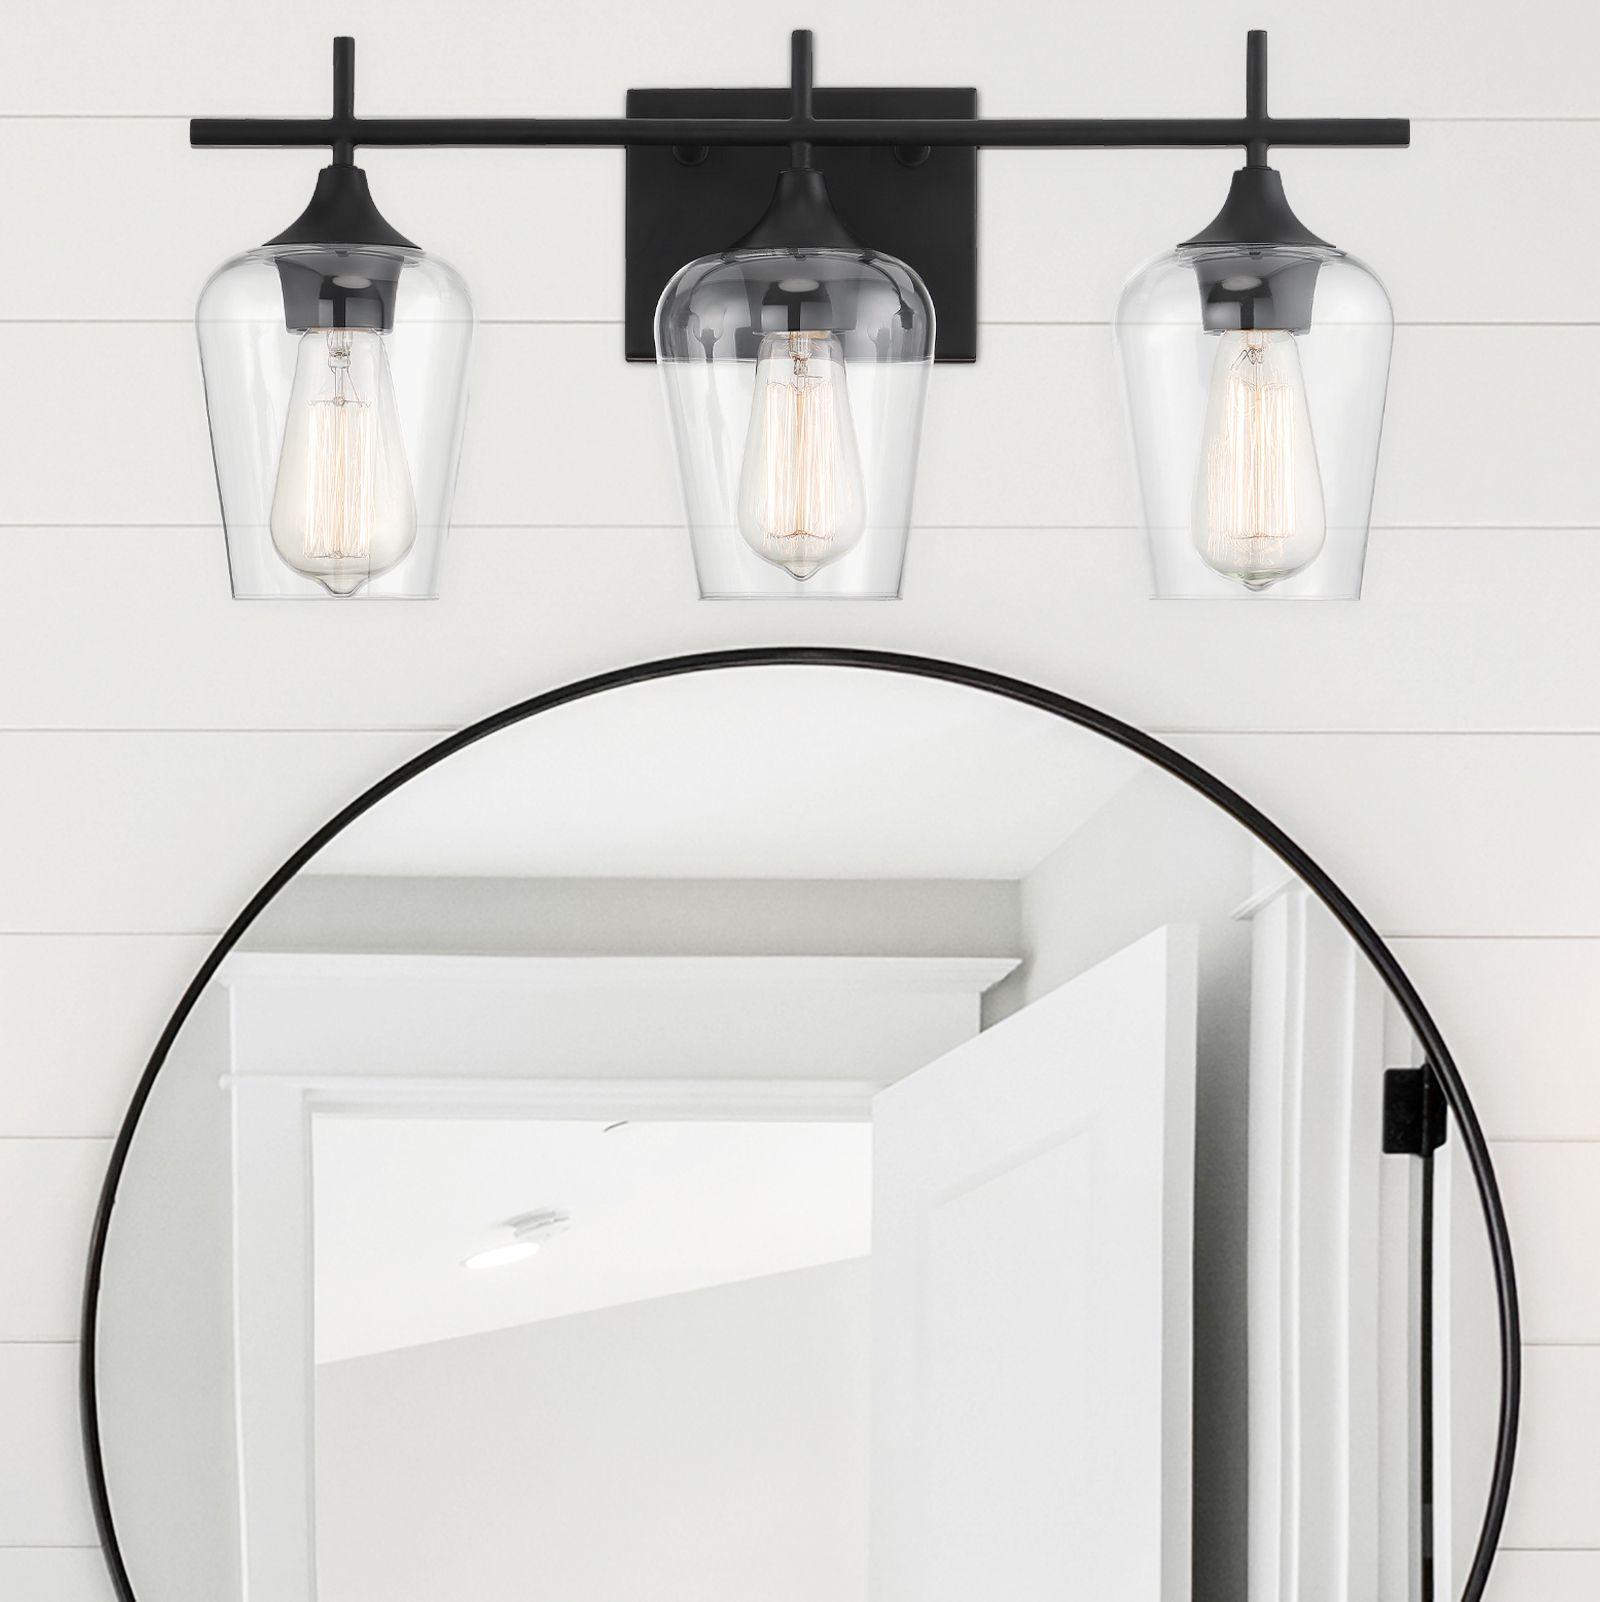 Savoy House Octave 3 Light Bathroom Vanity Light In Black Savoy House Lighting Bathroom Lighting Bathroom Vanity Lighting